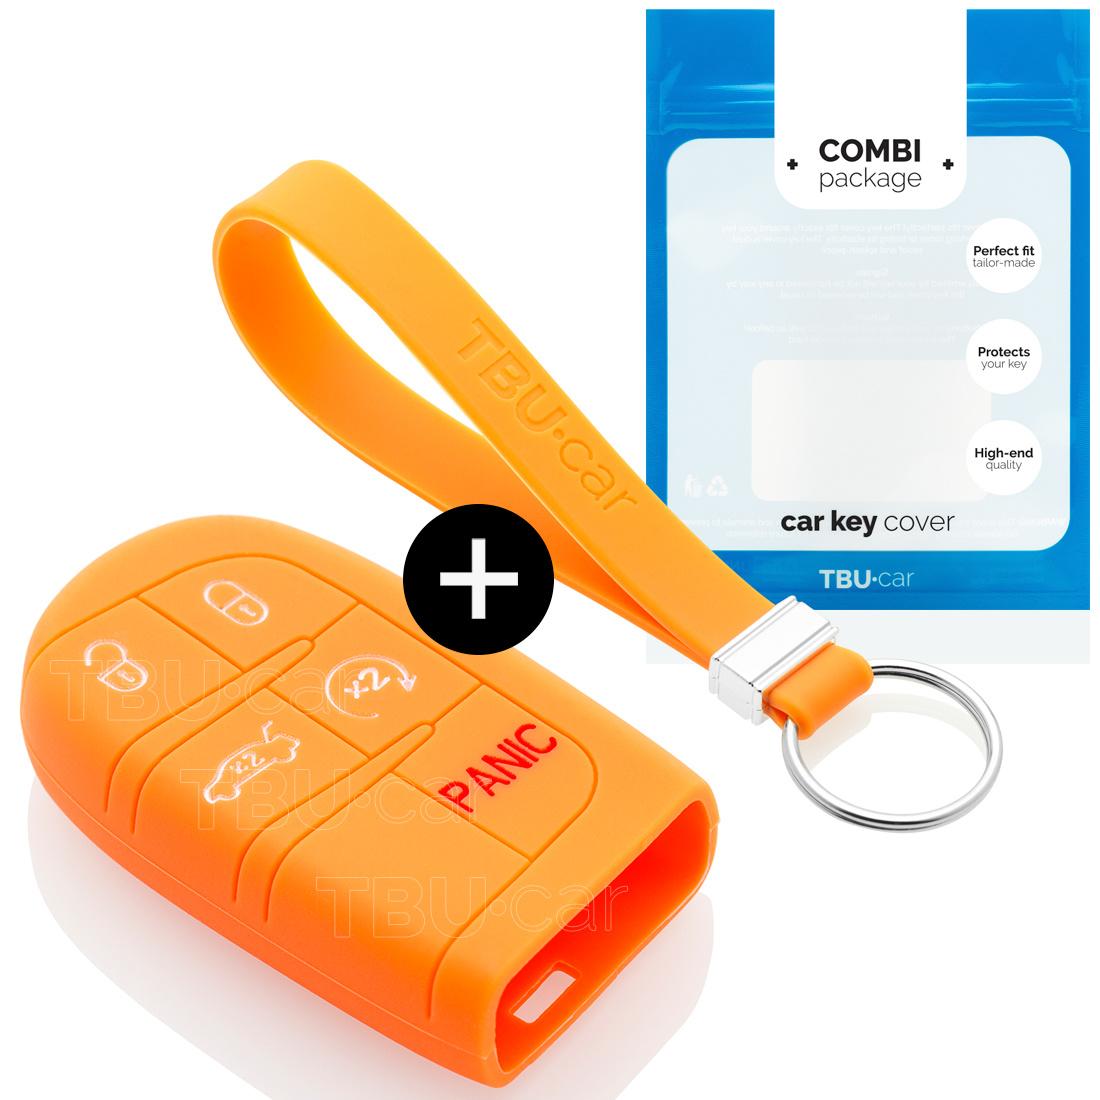 TBU car TBU car Sleutel cover compatibel met Jeep - Silicone sleutelhoesje - beschermhoesje autosleutel - Oranje